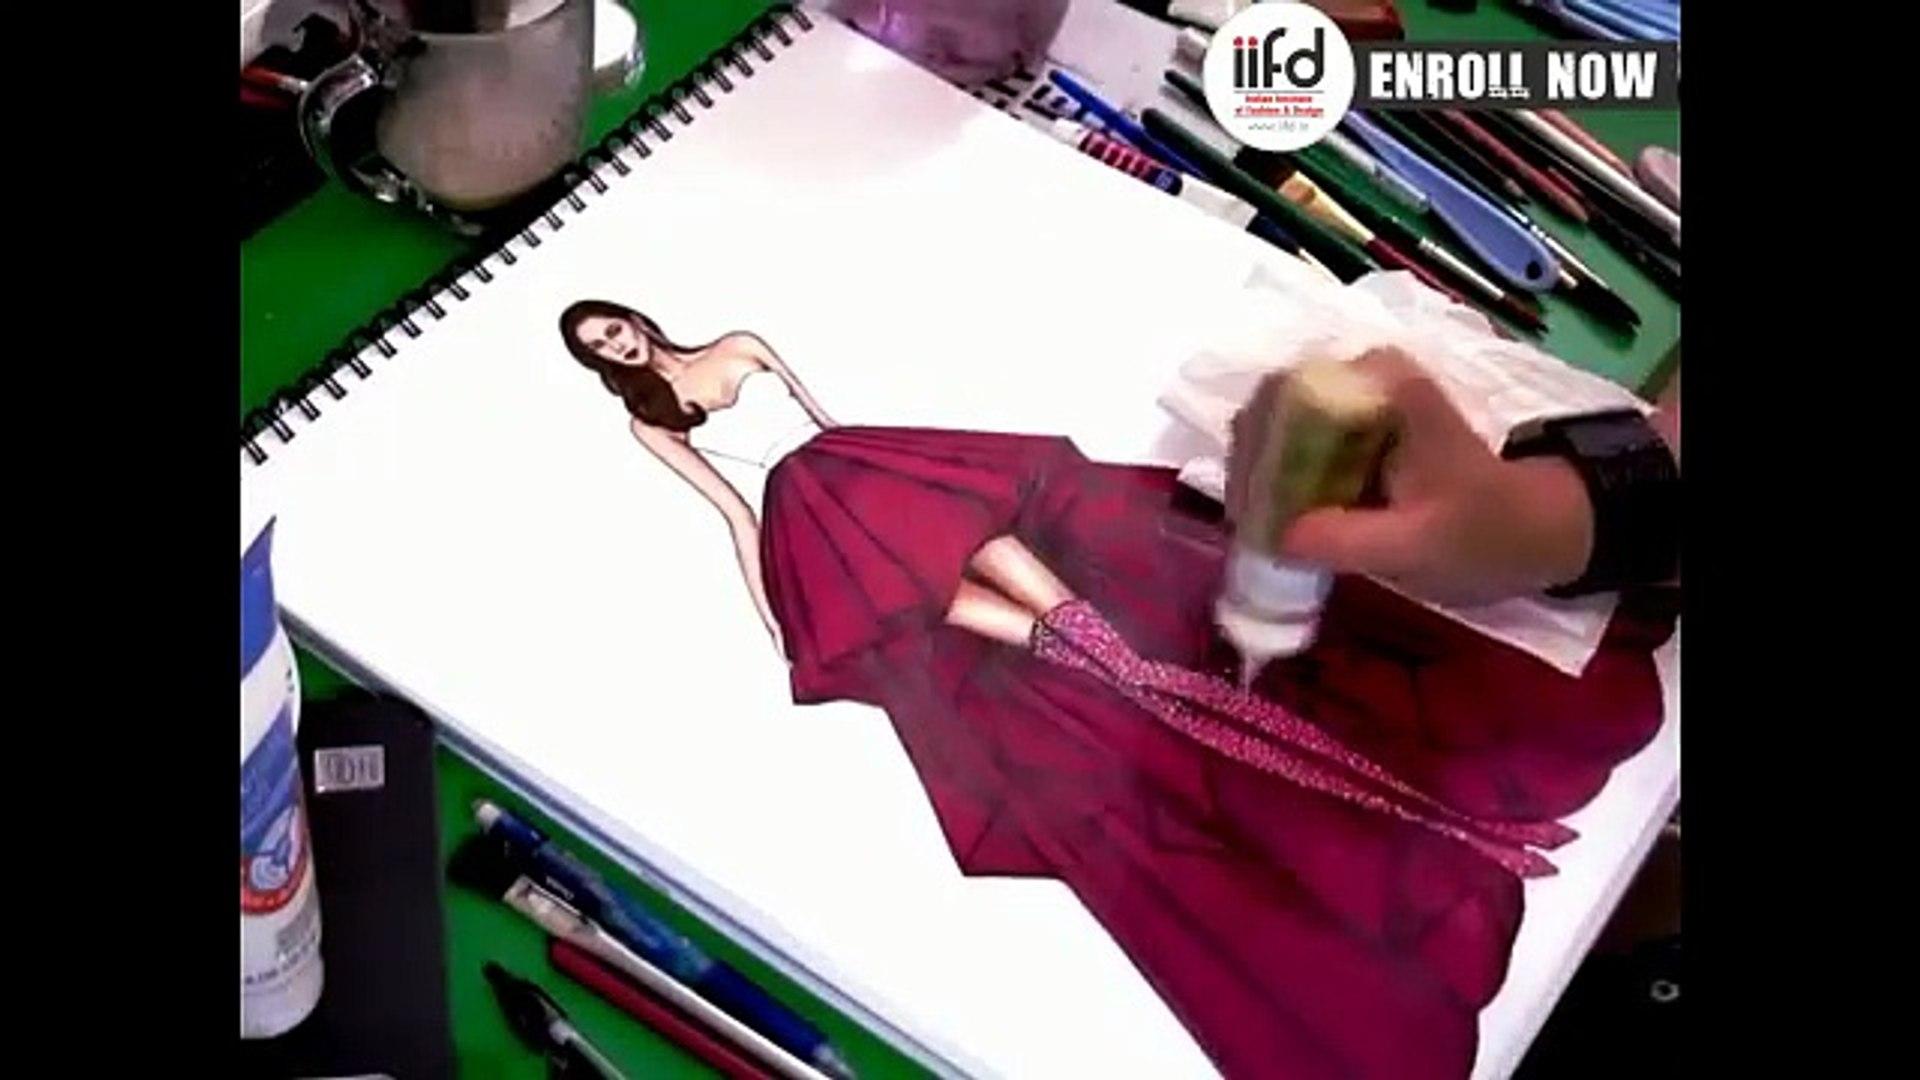 Best Fashion Designing Institute In Chandigarh Mohali Punjab Iifd Video Dailymotion